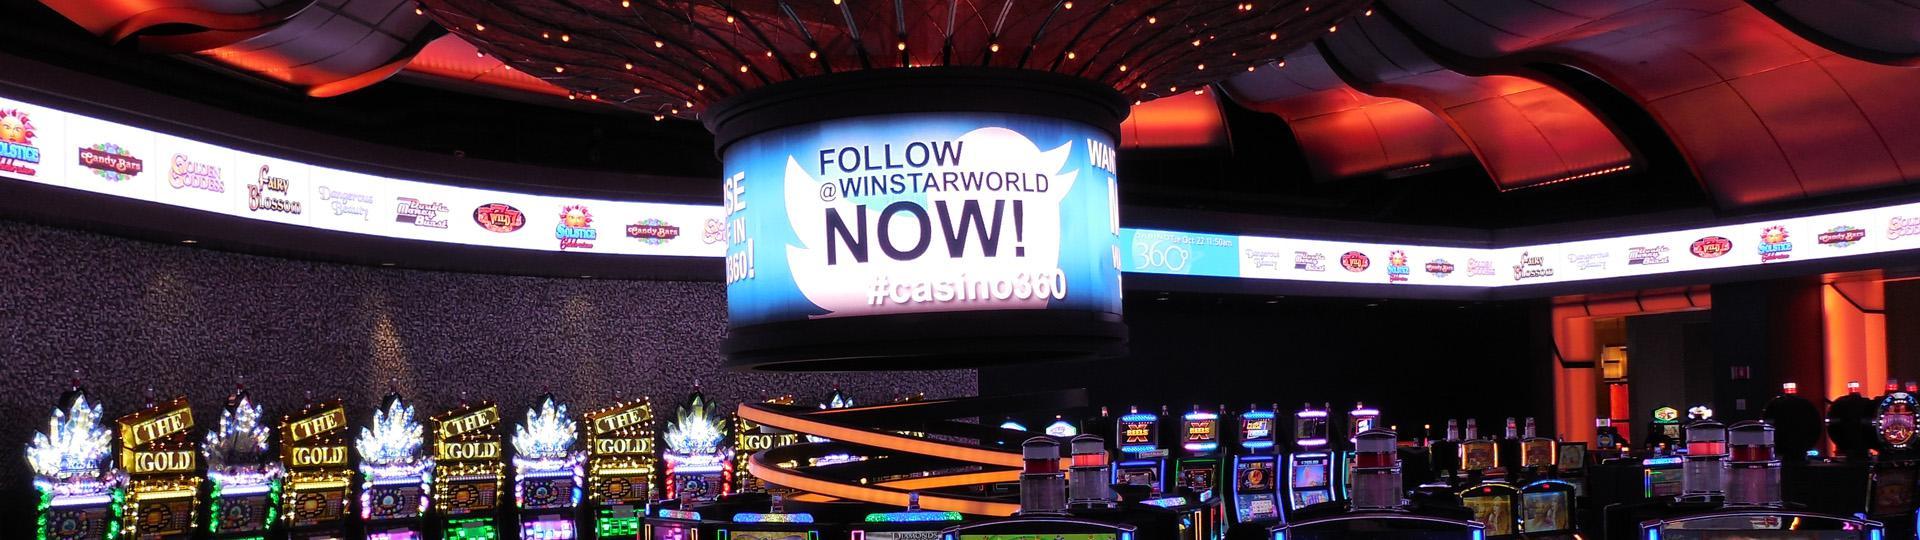 Digital signage & IPTV solutions for gaming